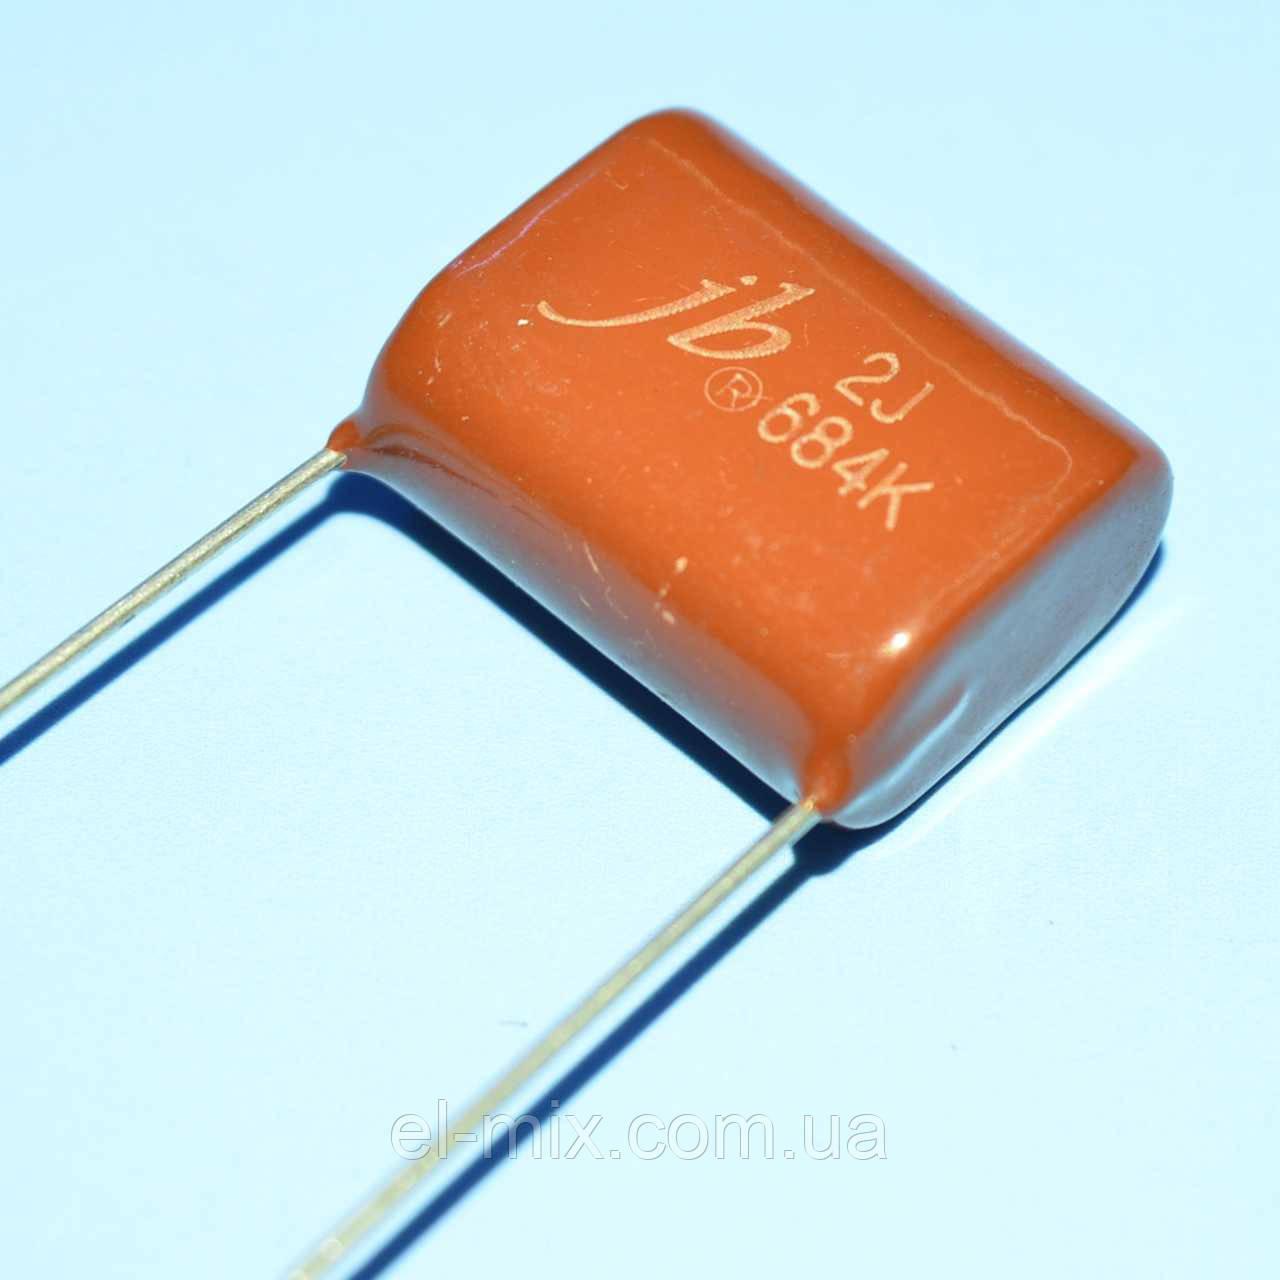 Конденсатор металлопленочный CL-21 0.68 µF 630V(2J) ±10% JB